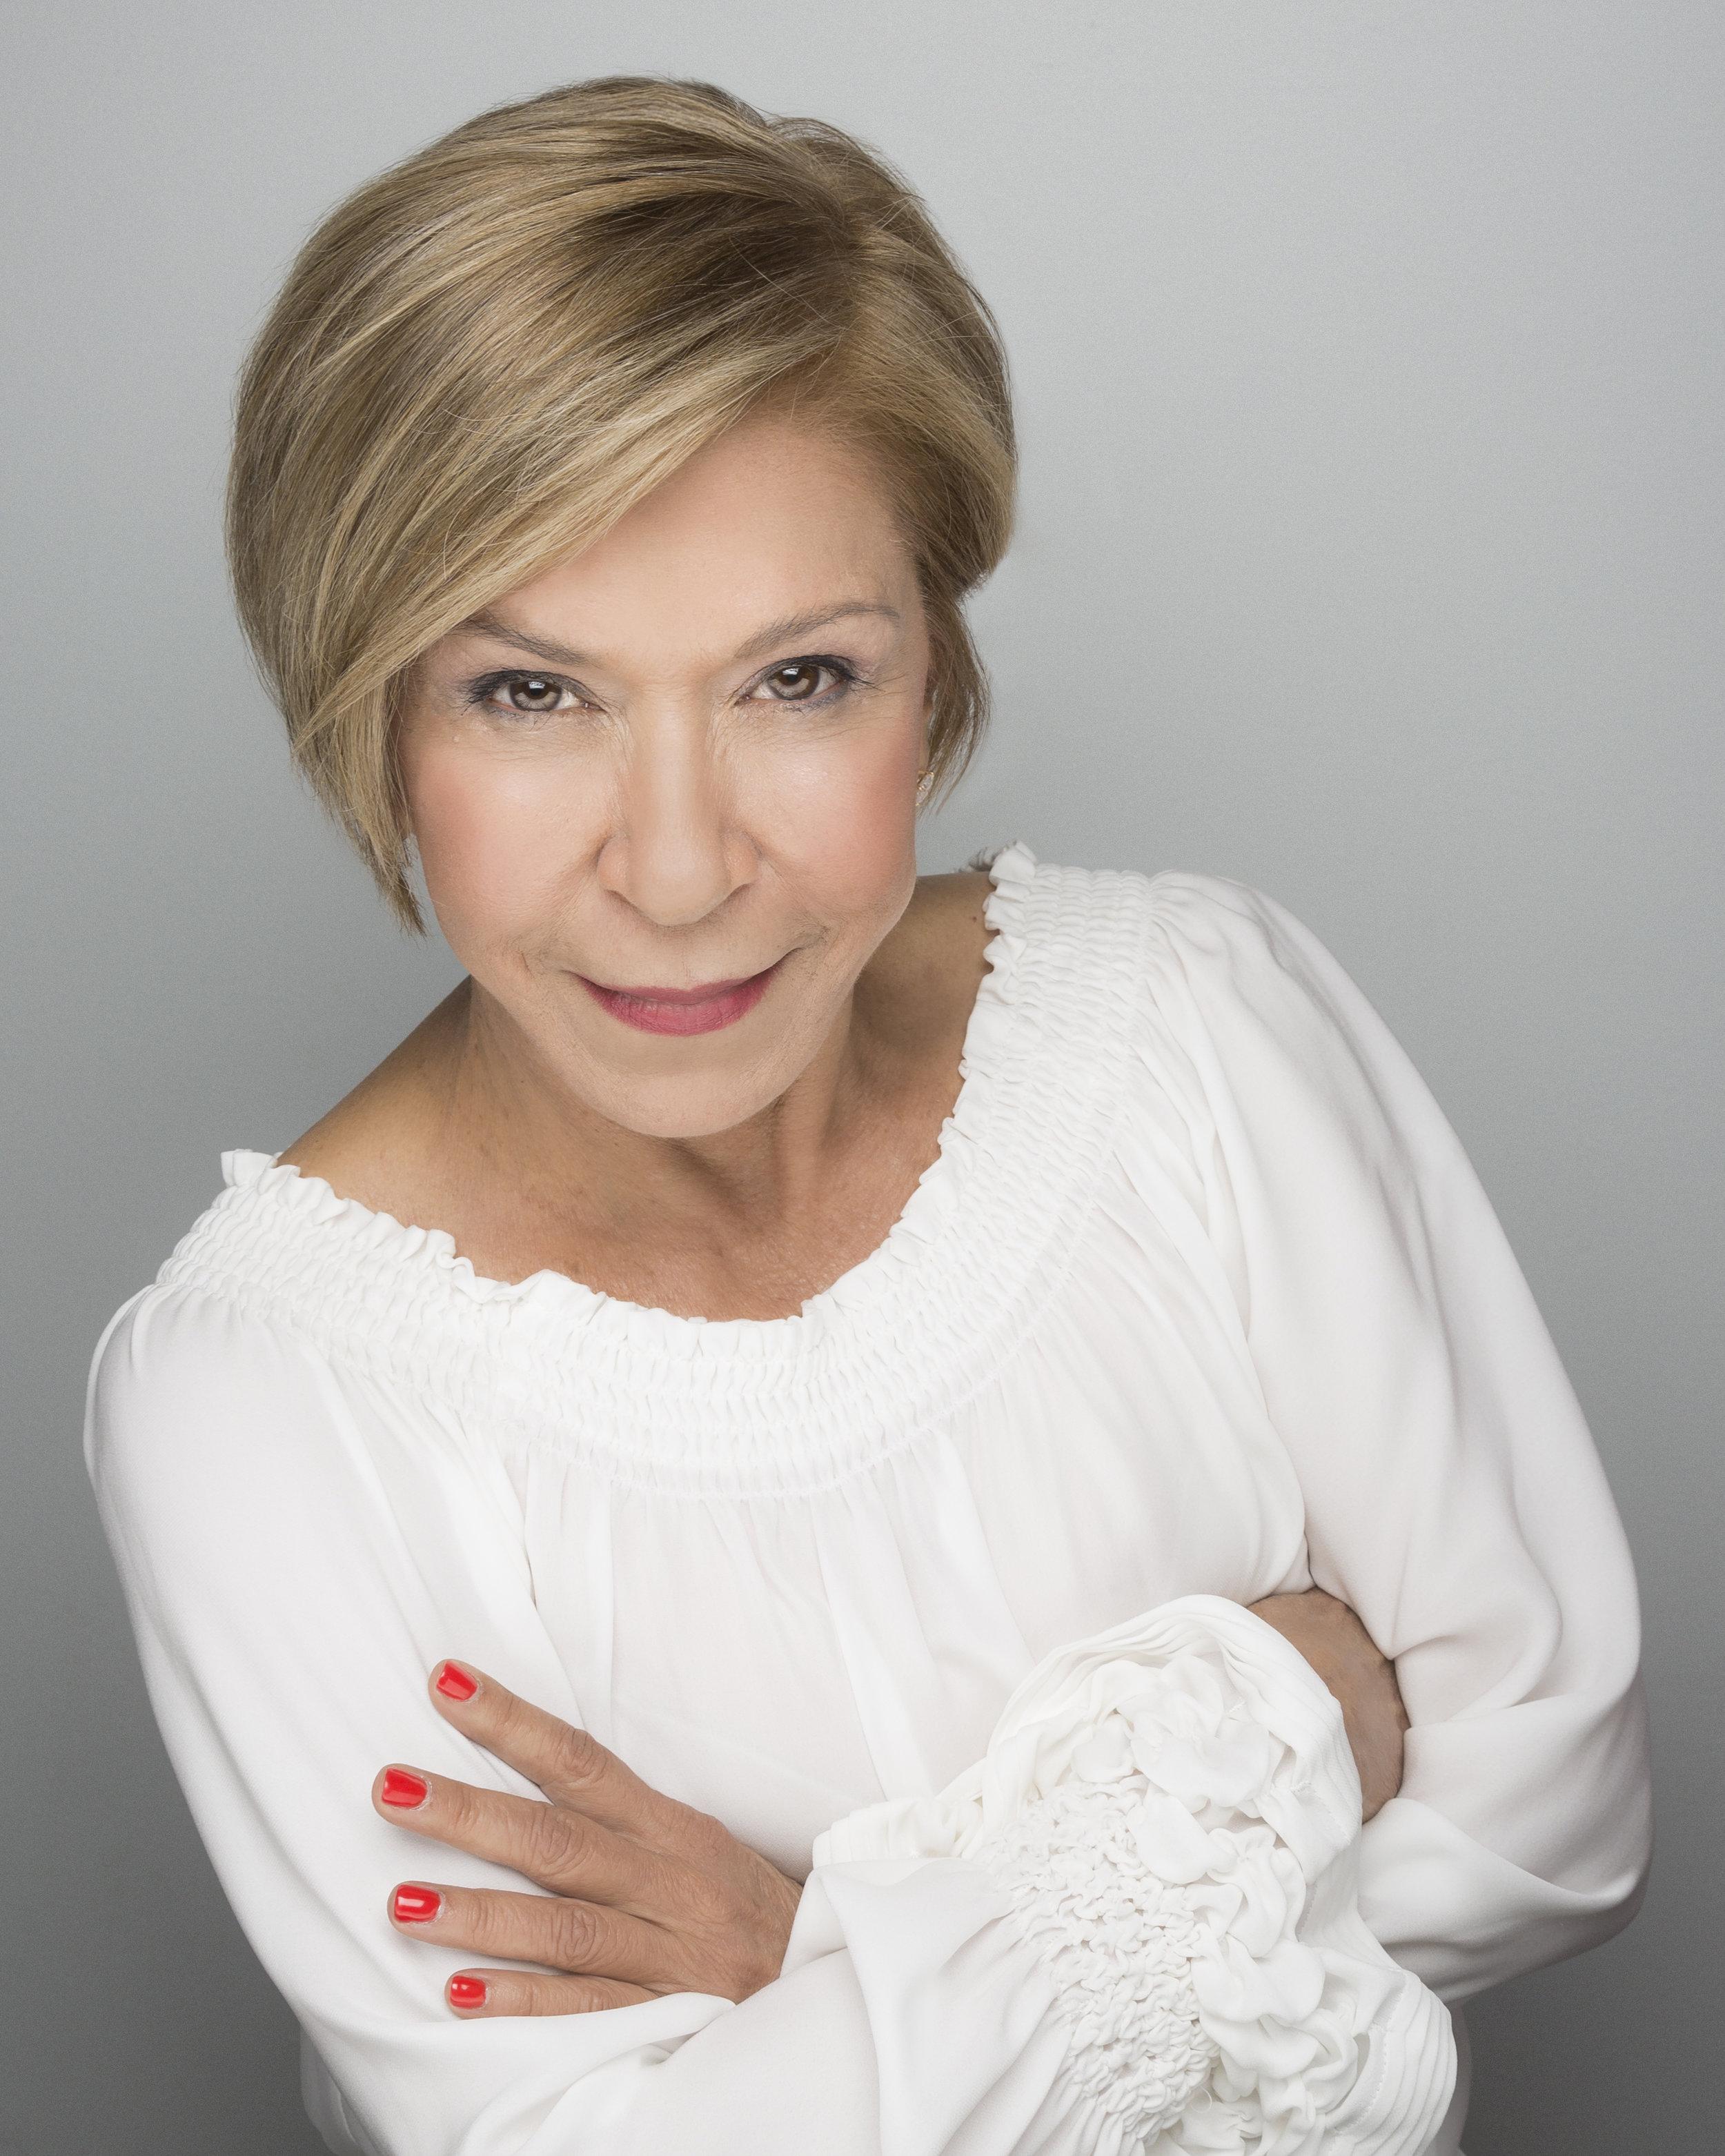 Nancy Reynolds  - Principal. Representative for South Florida, Southwest Florida, Greater Tampa, Orlando, and the Caribbean.  (954) 410-7272   nancy@nancyreynolds.com